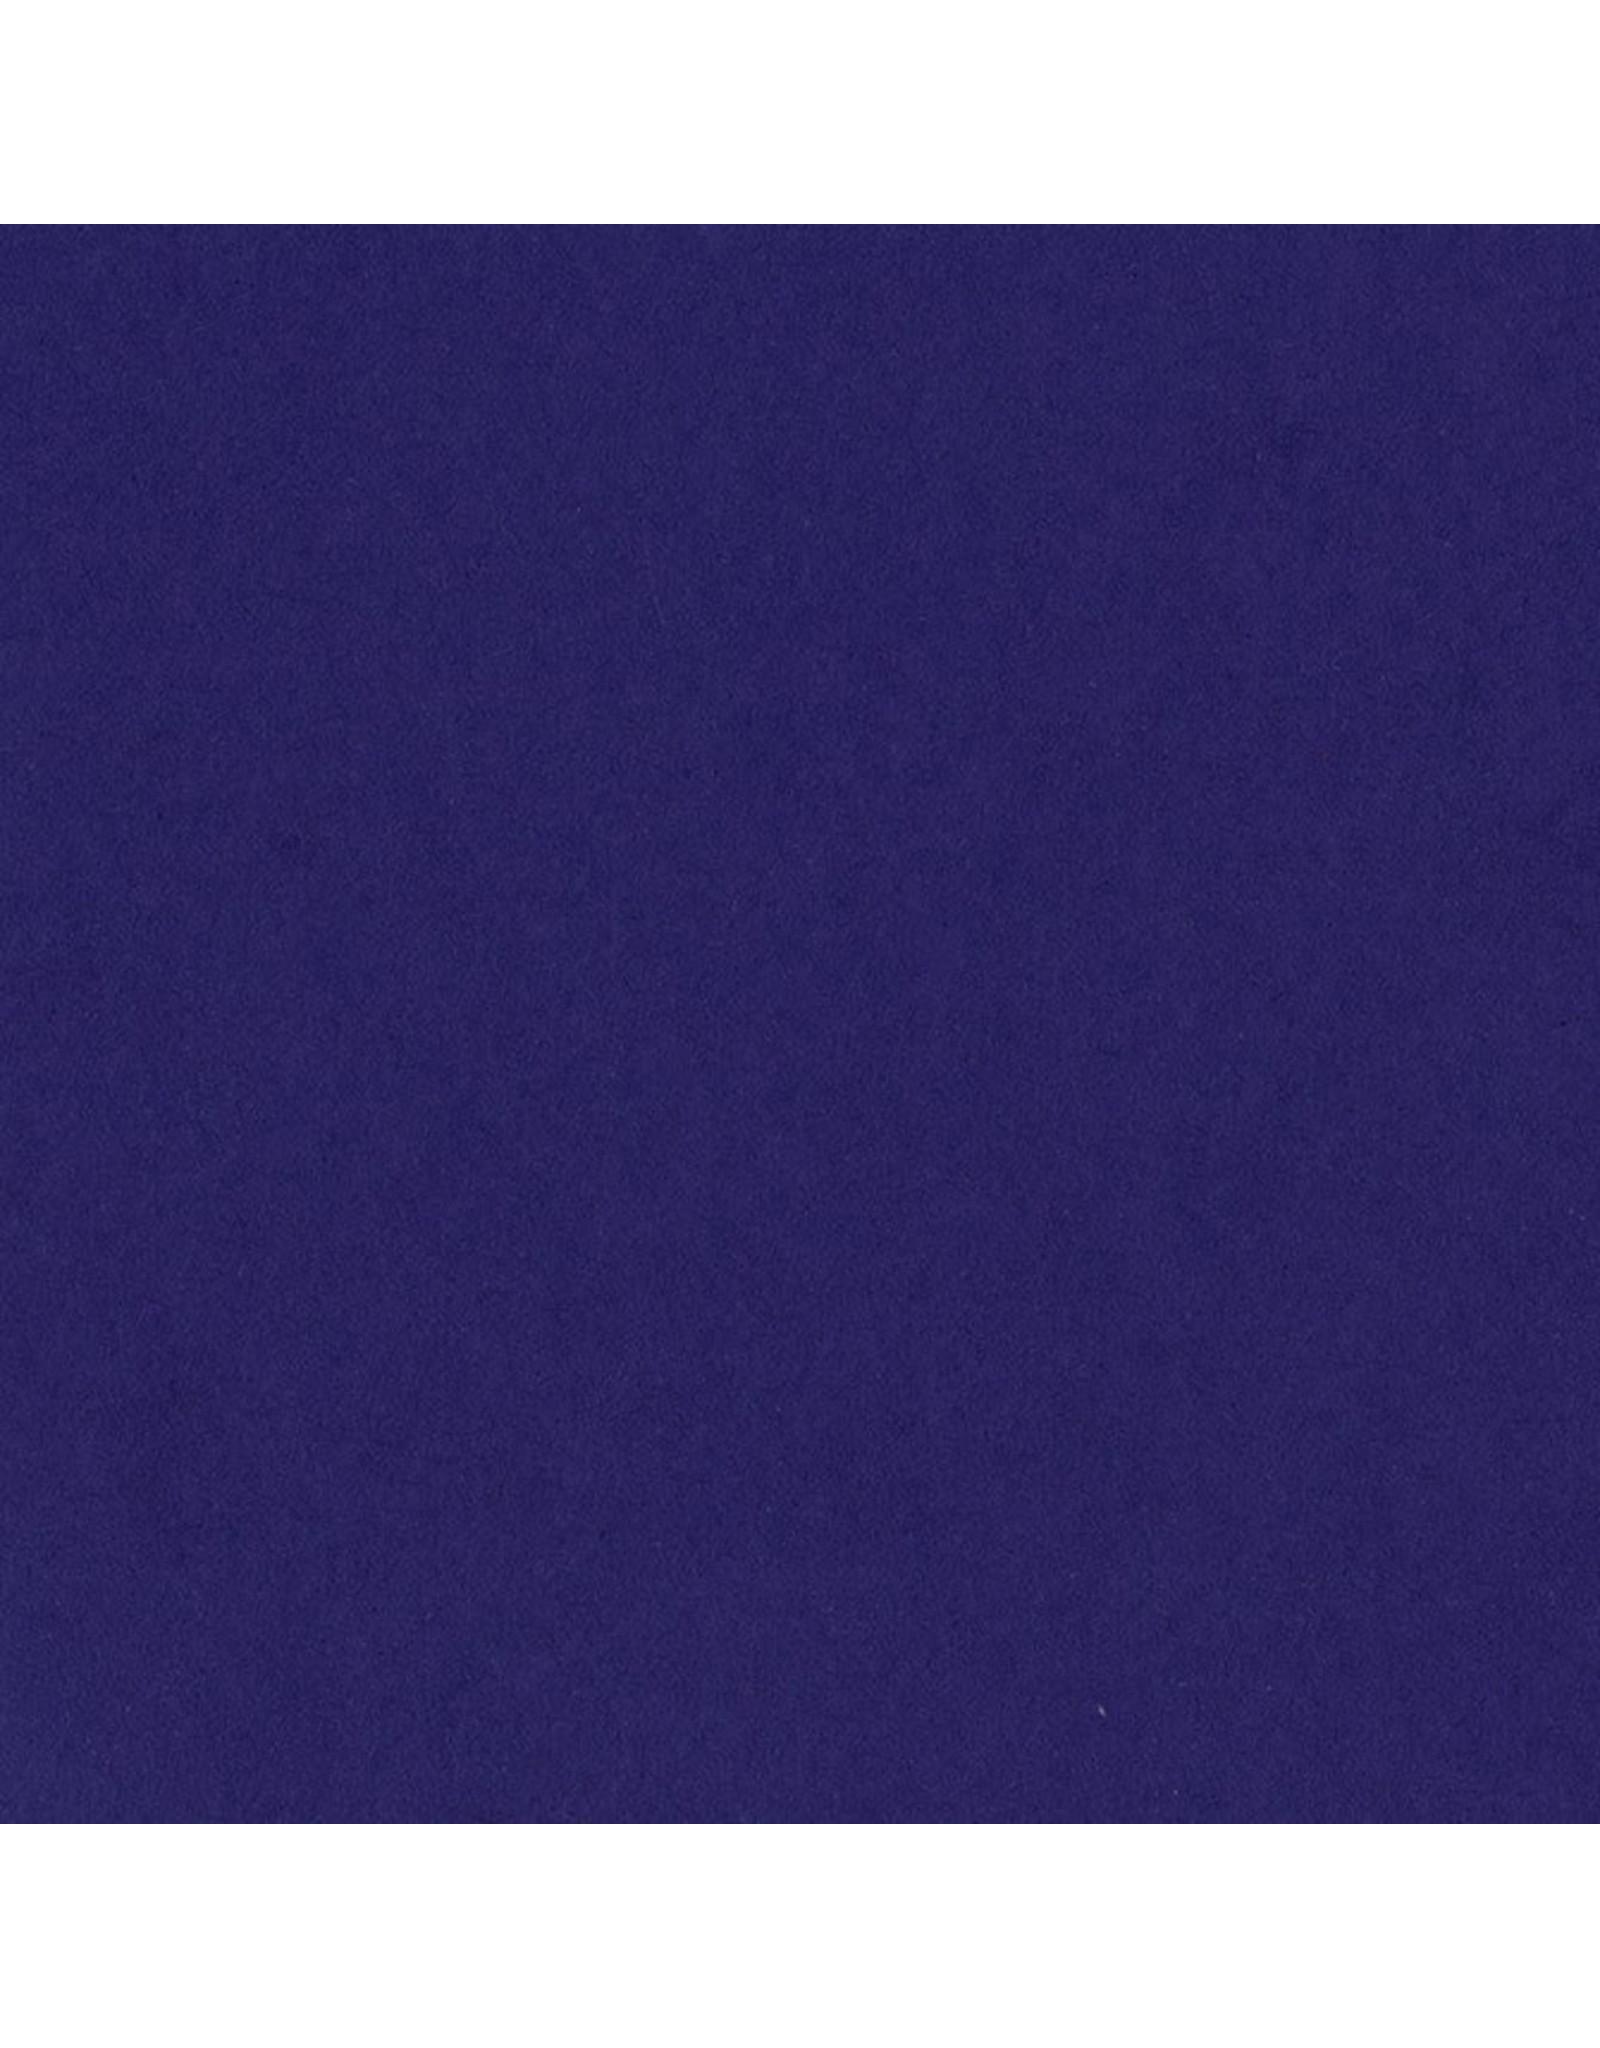 Bazzill Bazzill Card Shoppe 8.5x11 - Jelly Bean